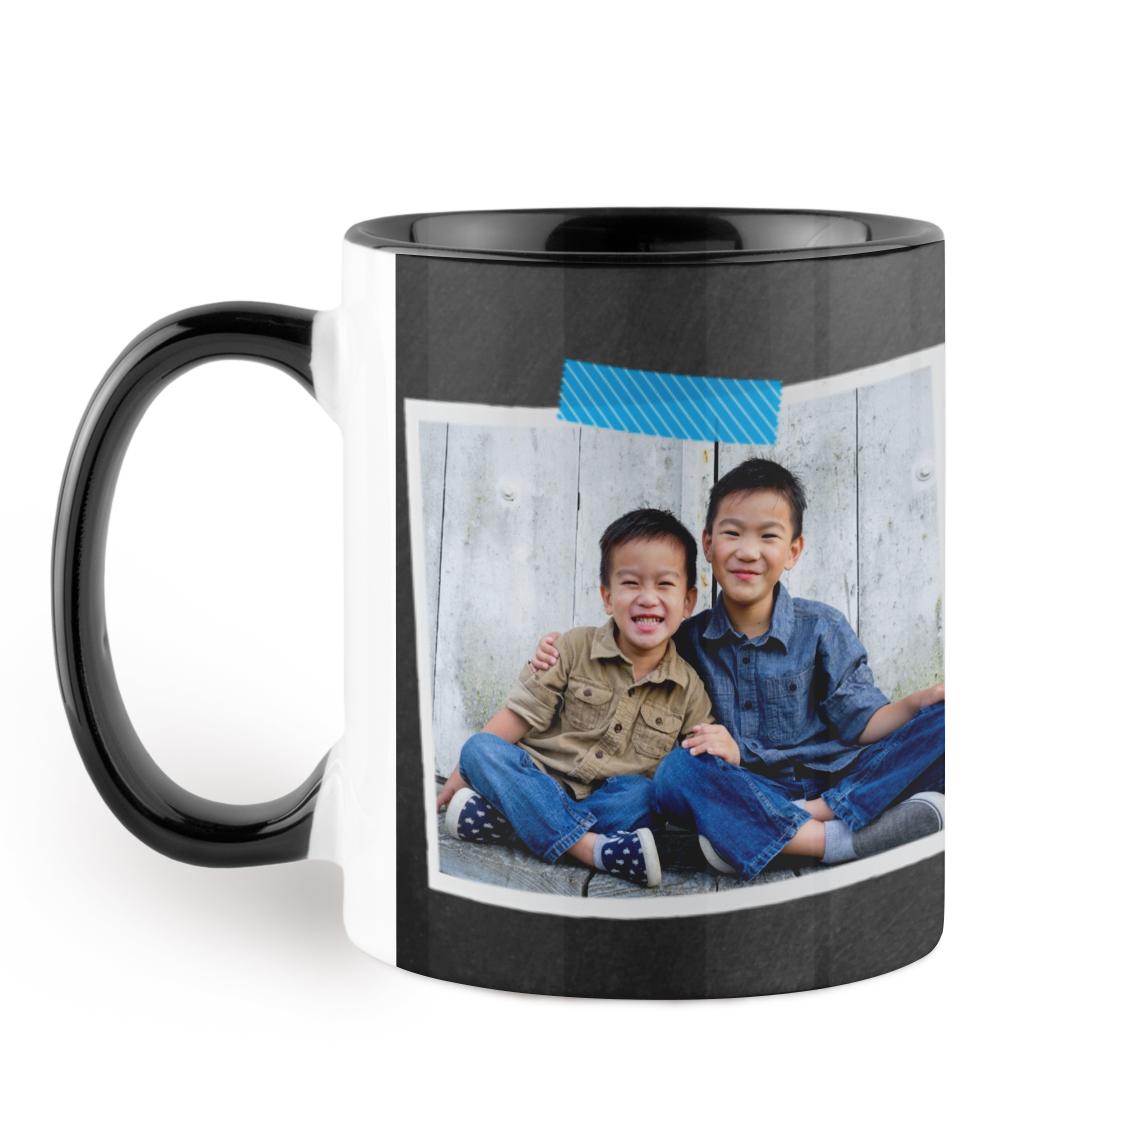 black colorful mug - Colorful Mugs